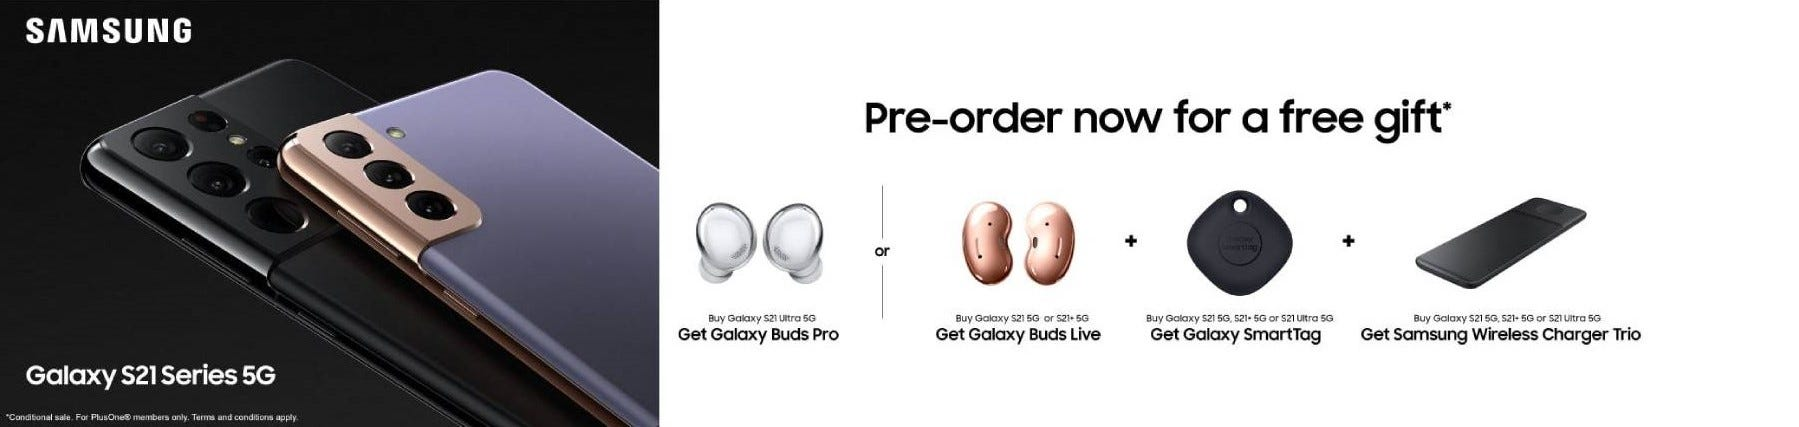 The Samsung Galaxy S21 Pre-Order